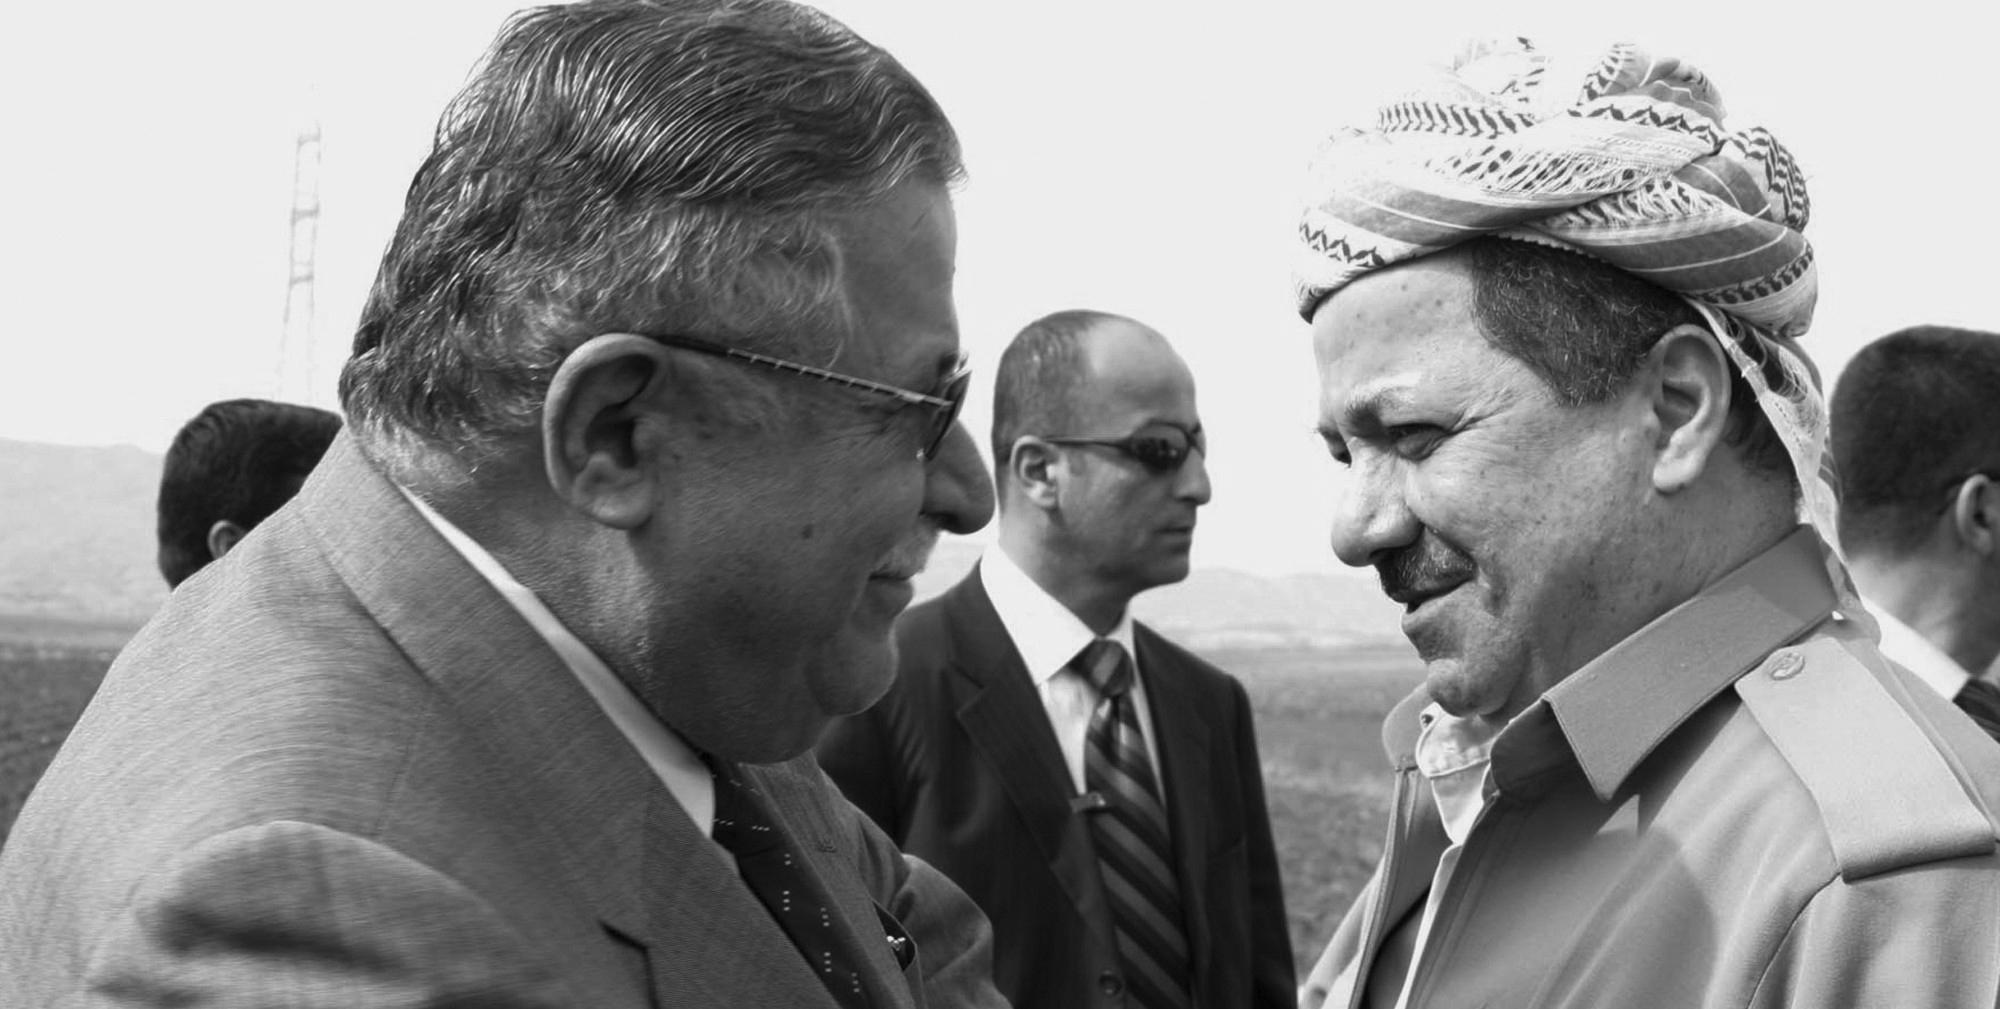 Präsident Barzanis Anteilnahme zum Ableben vom früheren Präsidenten Jalal Talabani